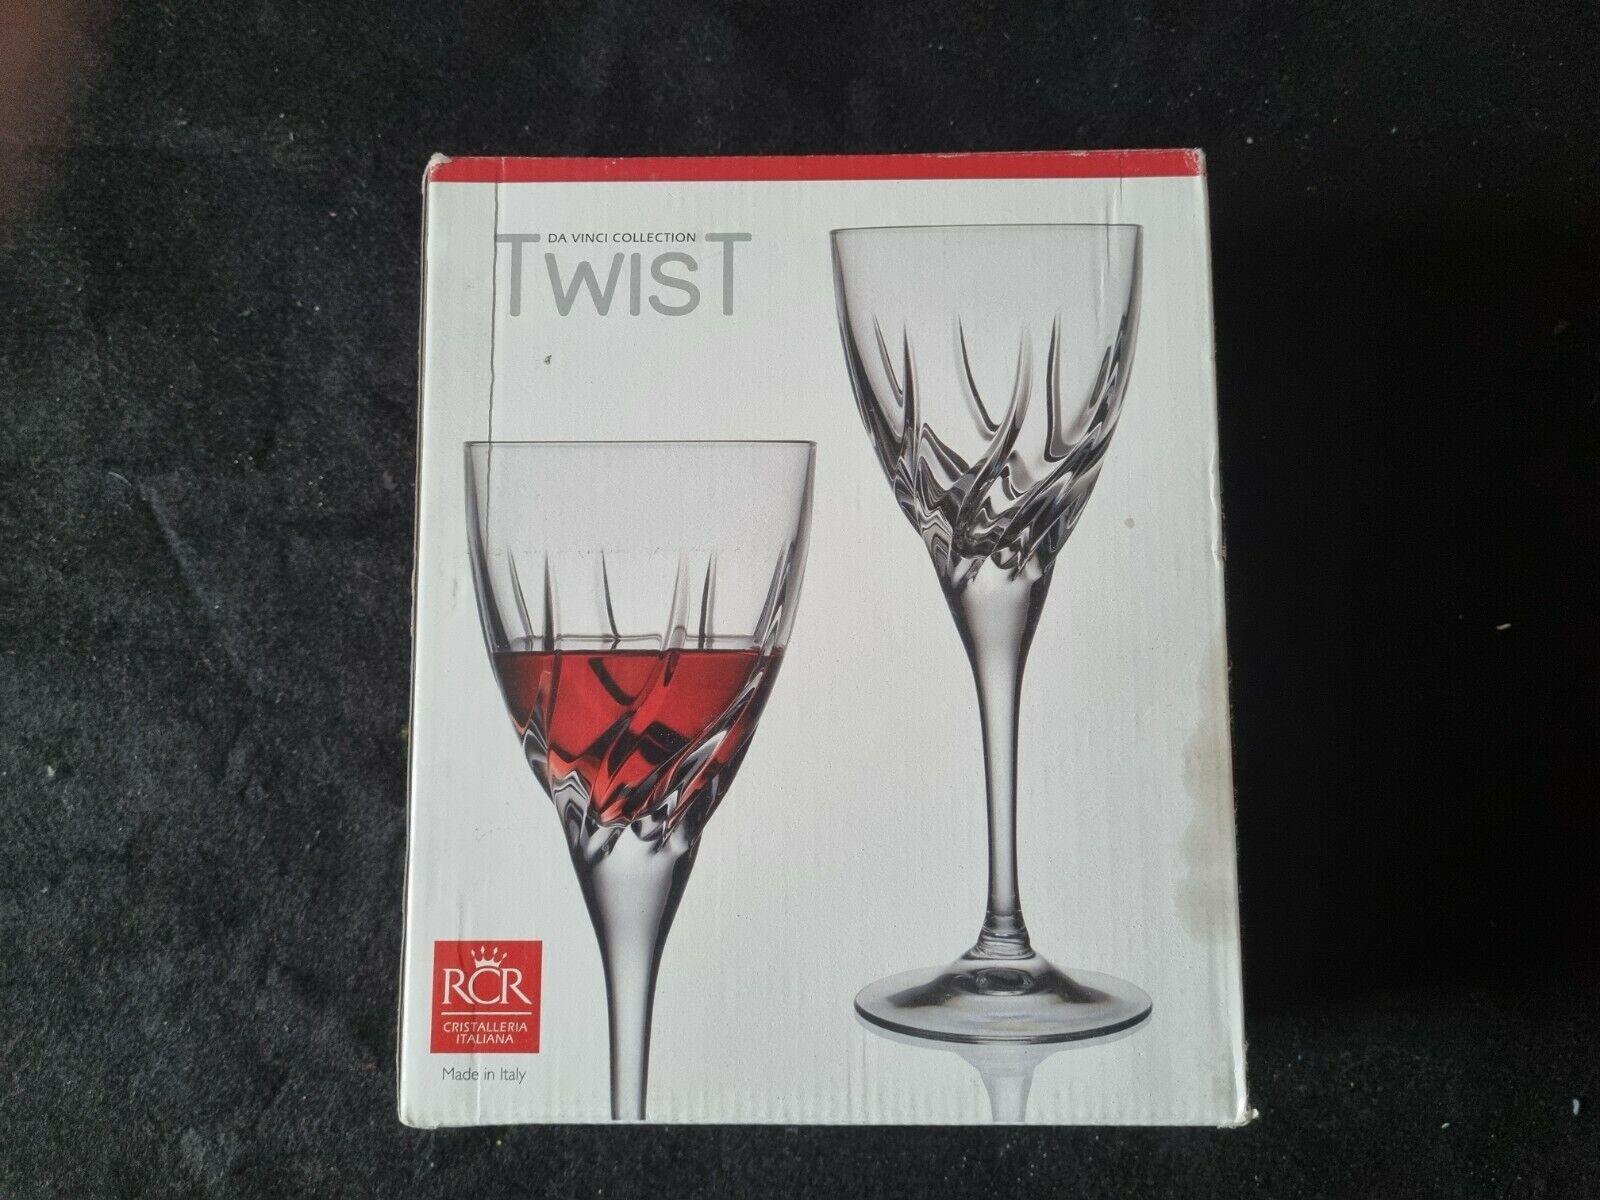 RCR Crystal Da Vinci Collection Twist Crystal Red Wine Glasses x 2